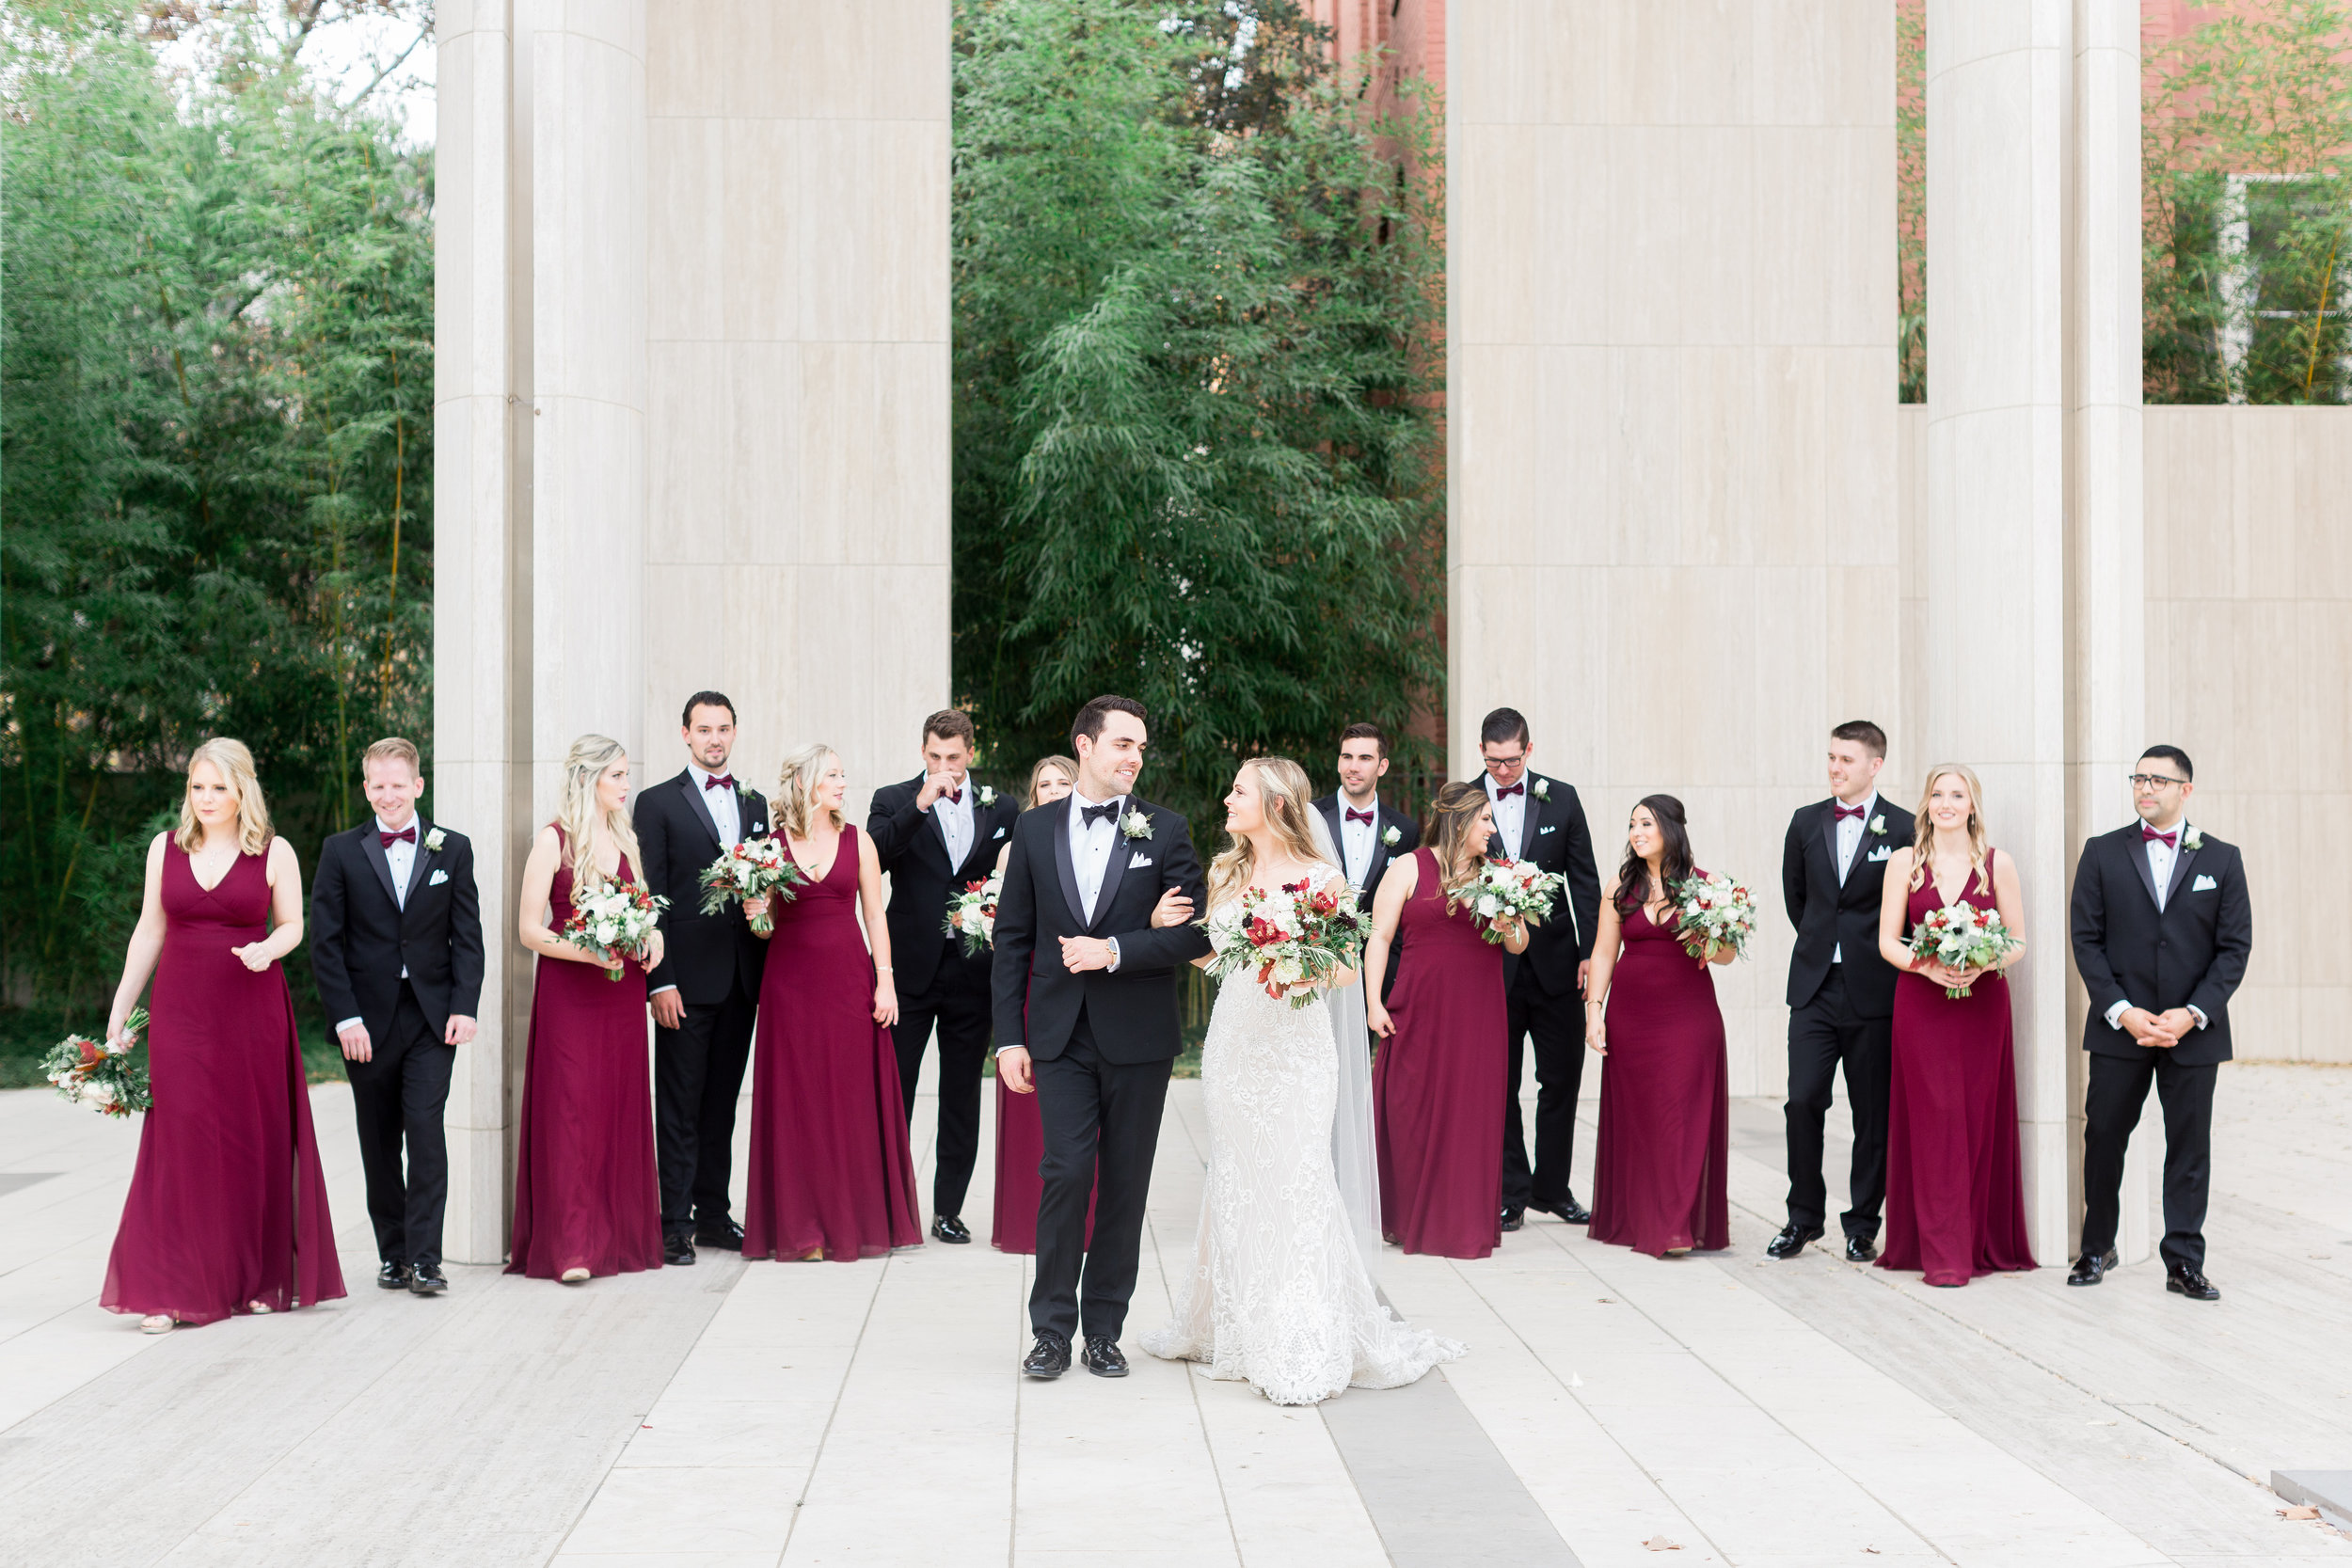 San-Jose-courthouse-bridal-party-photos(113 of 335).jpg